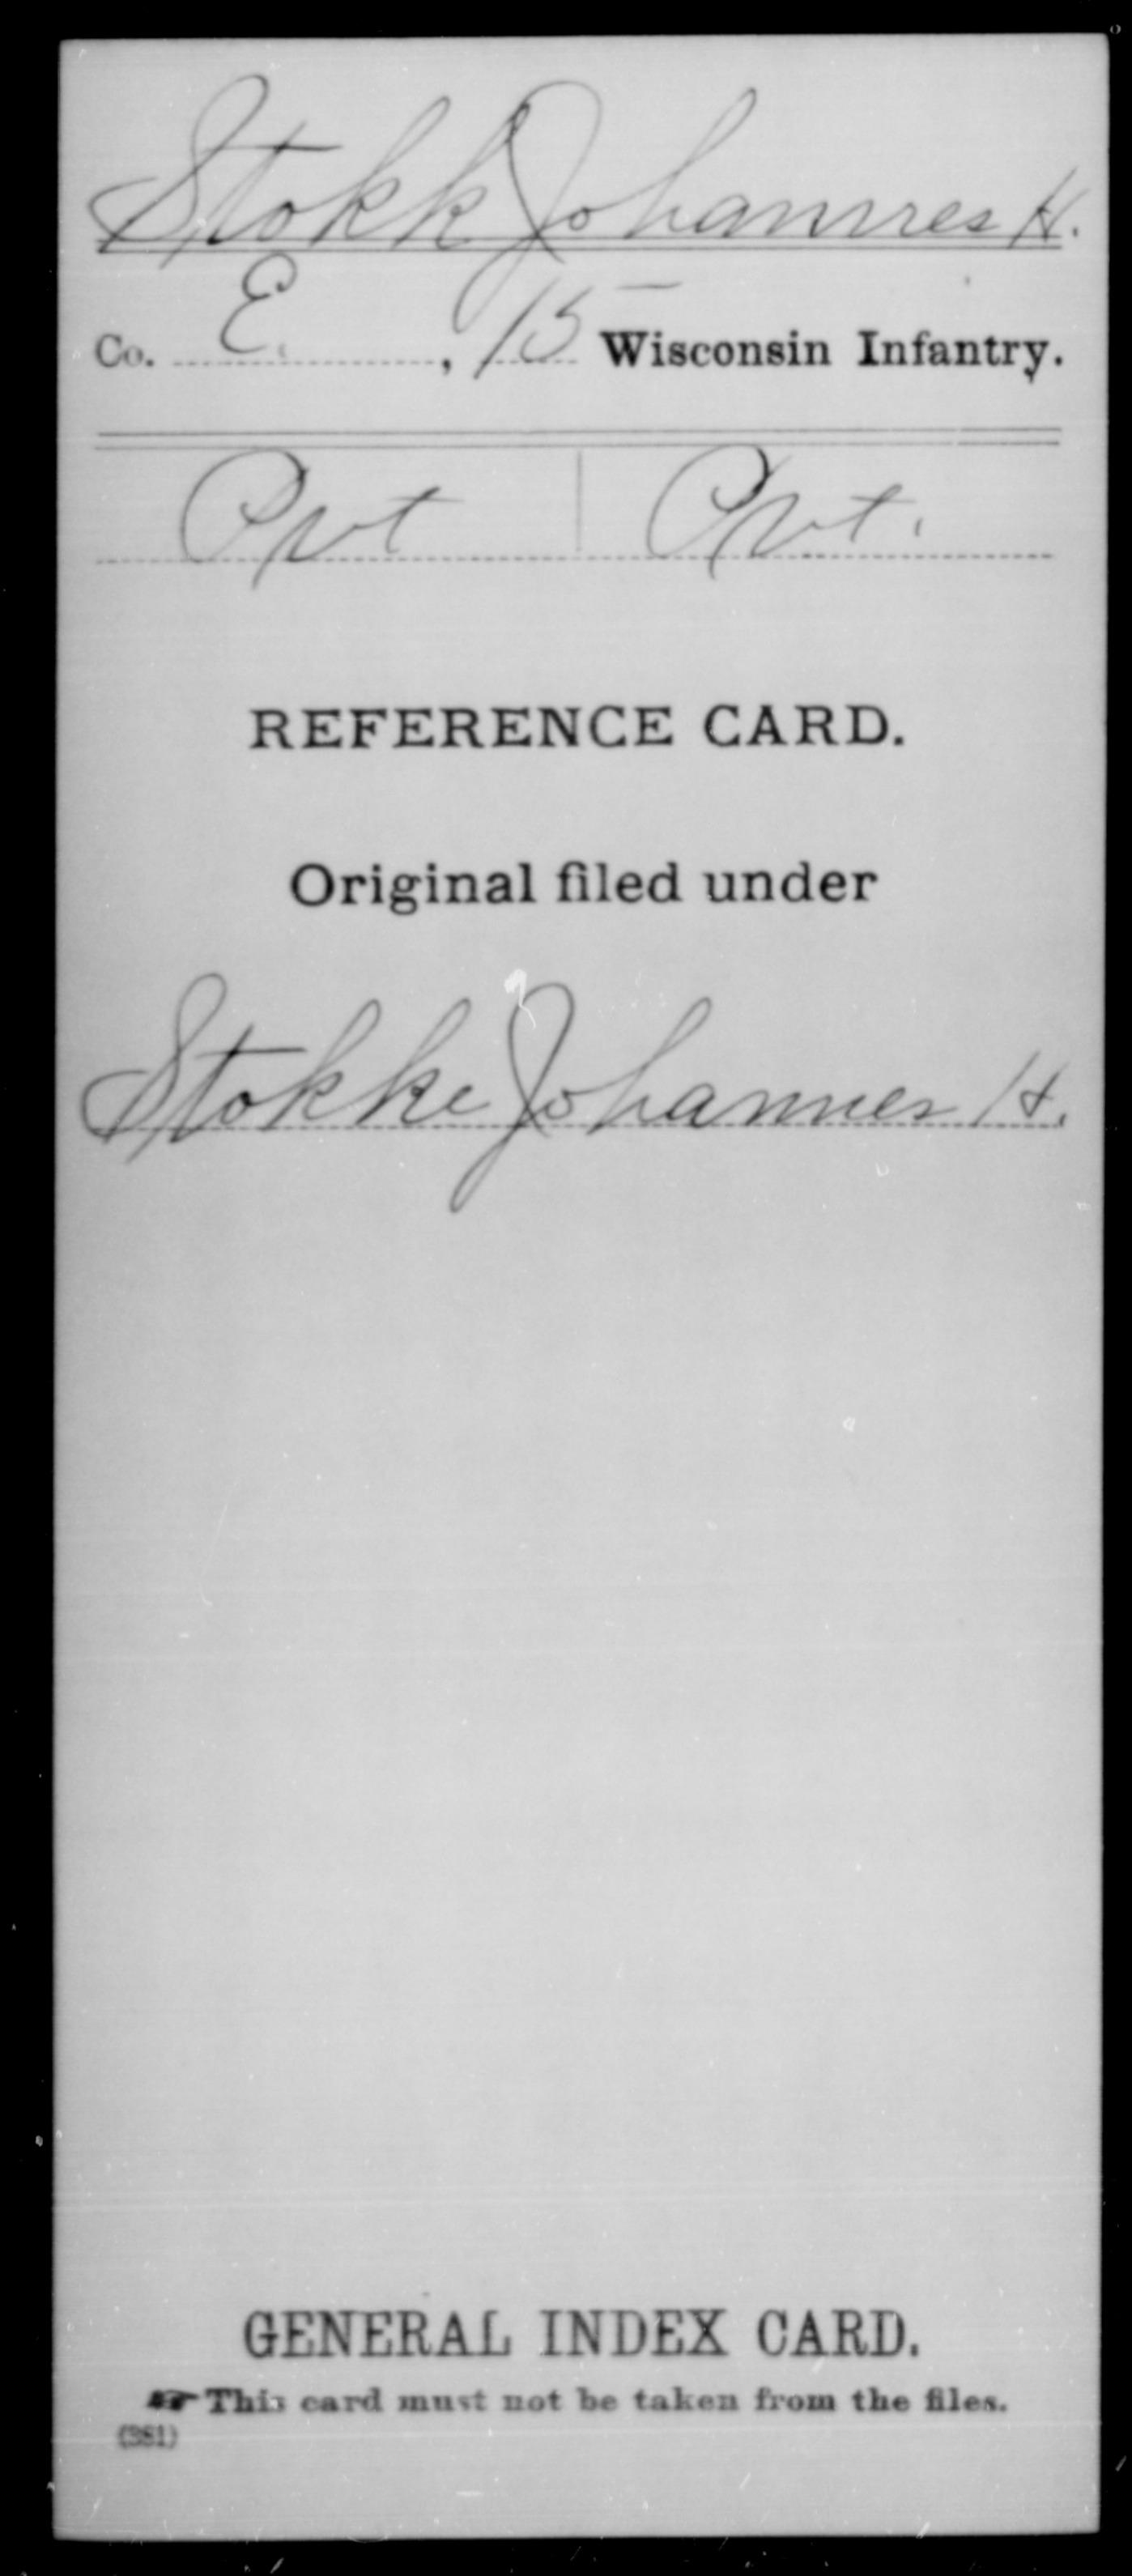 [Wisconsin] Stokk, Johannes H - 15th Infantry, Company E